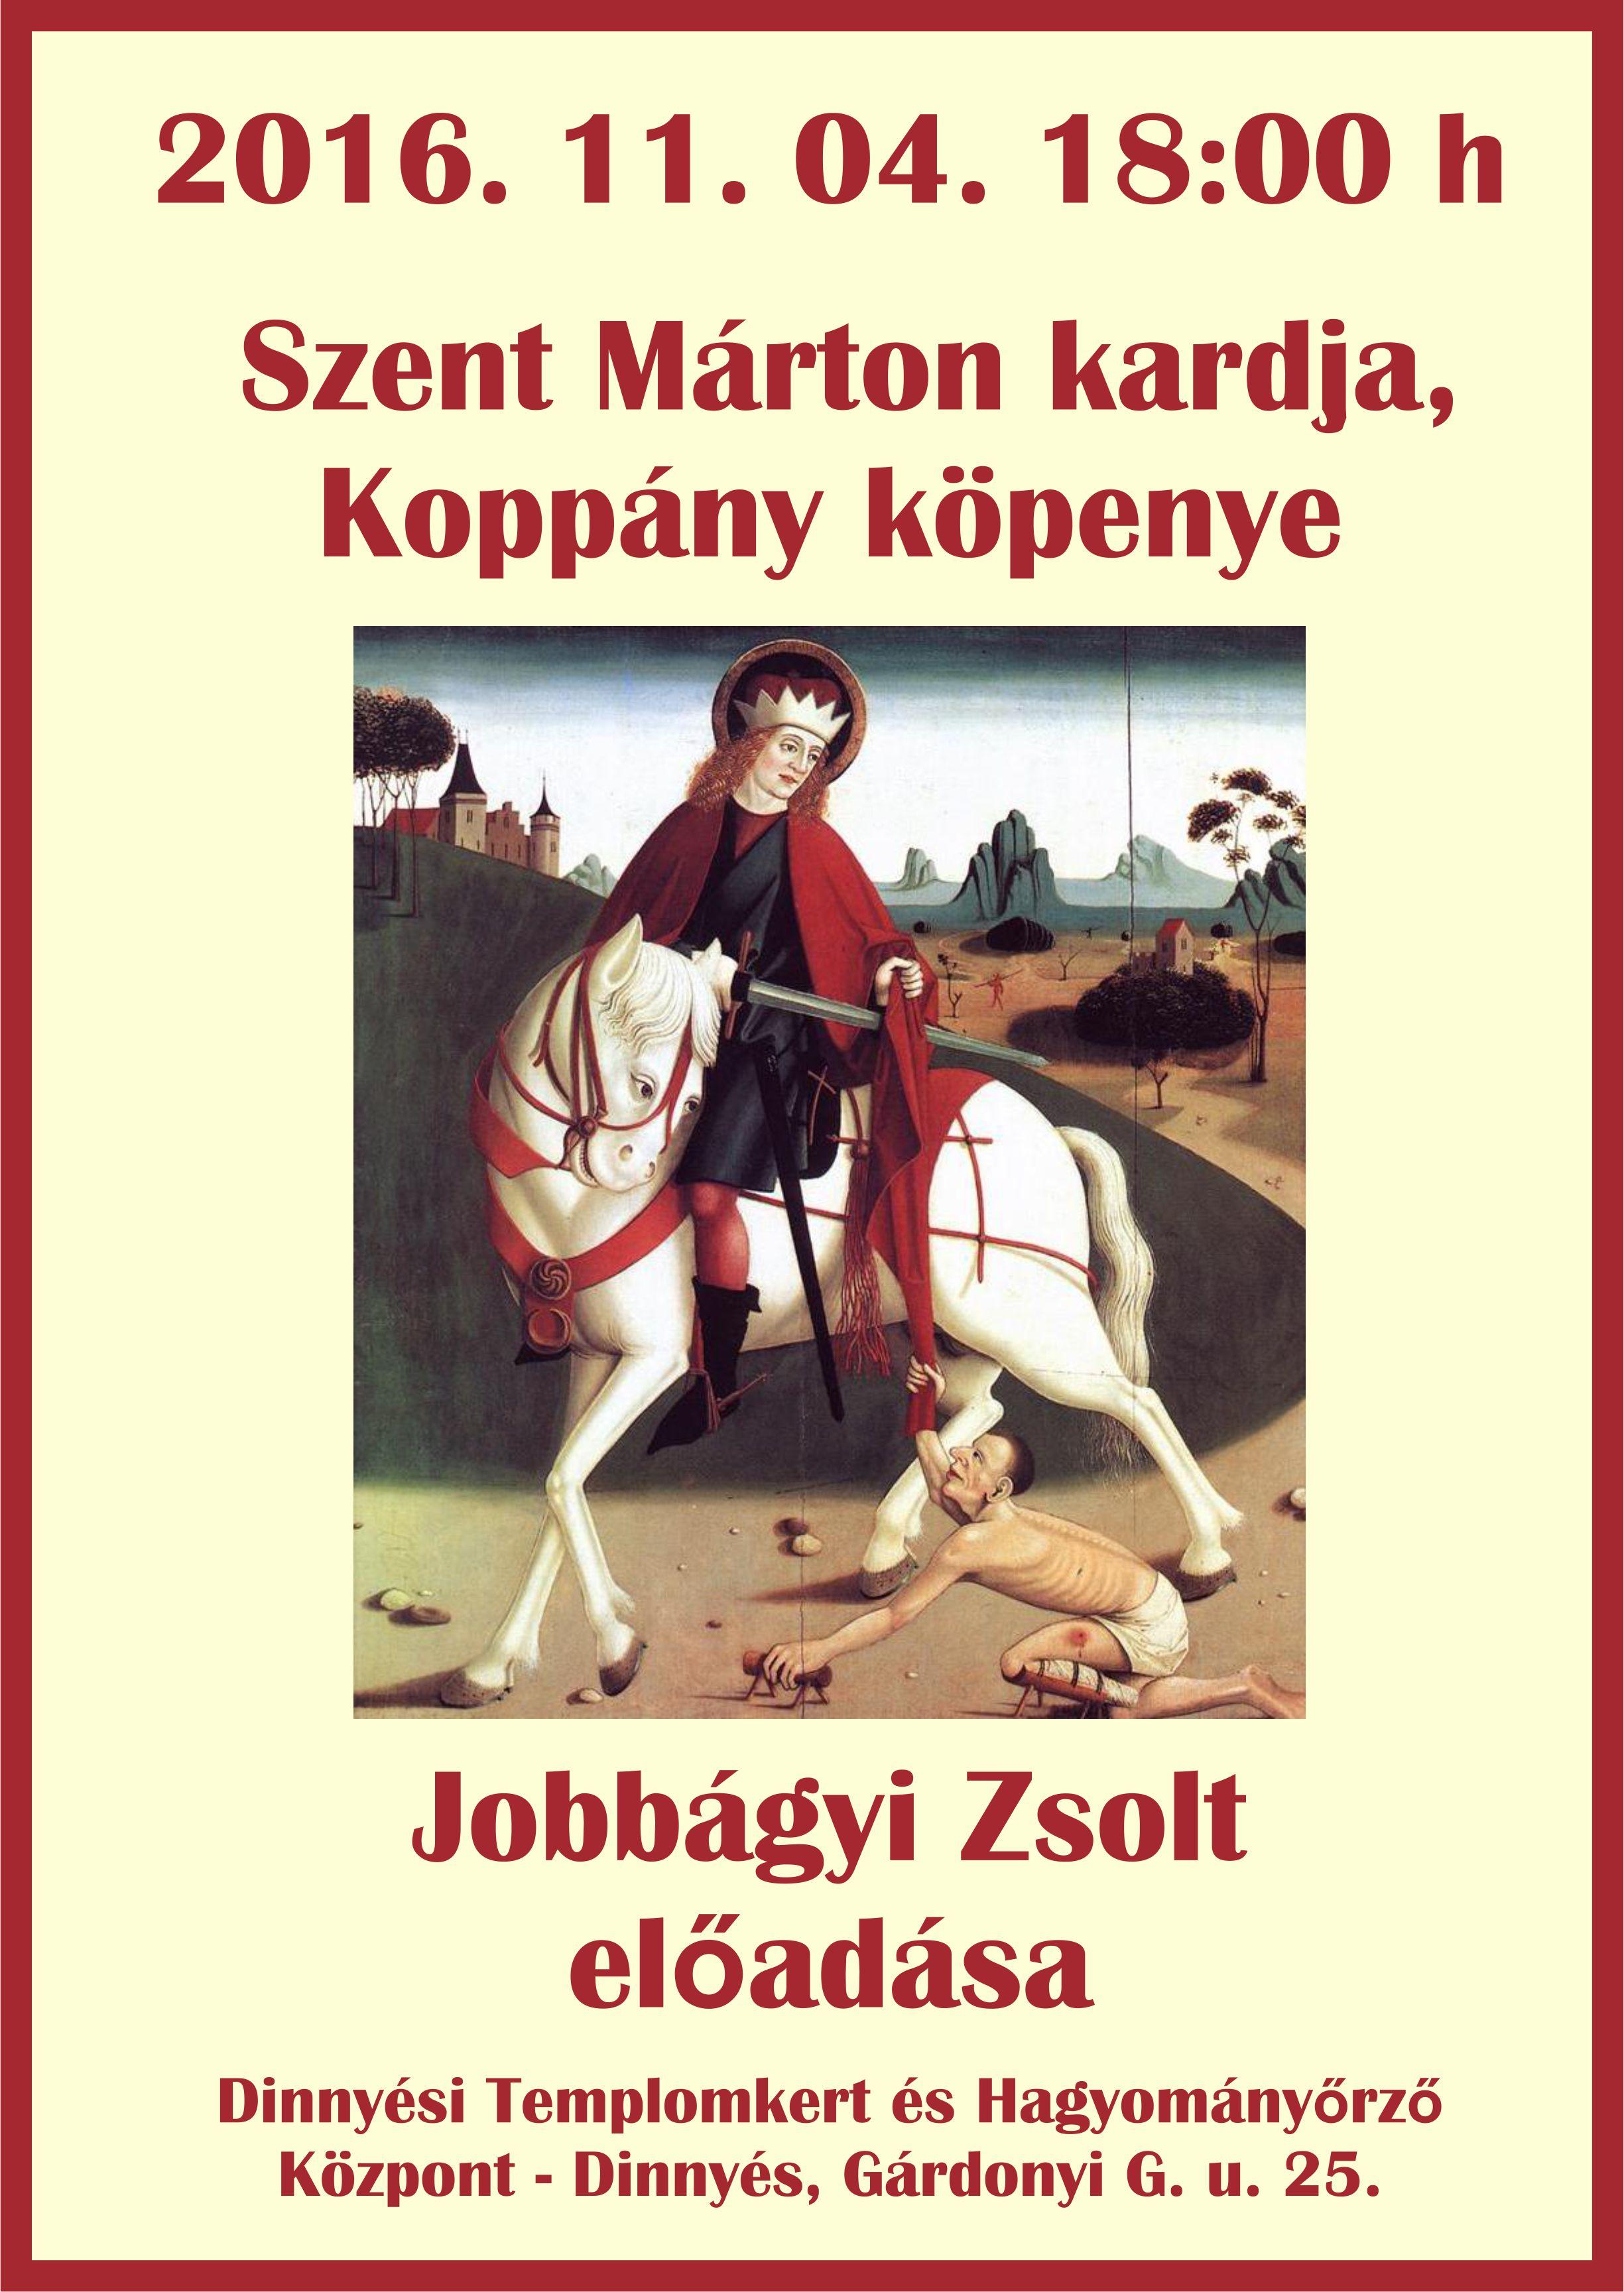 marton_kardja